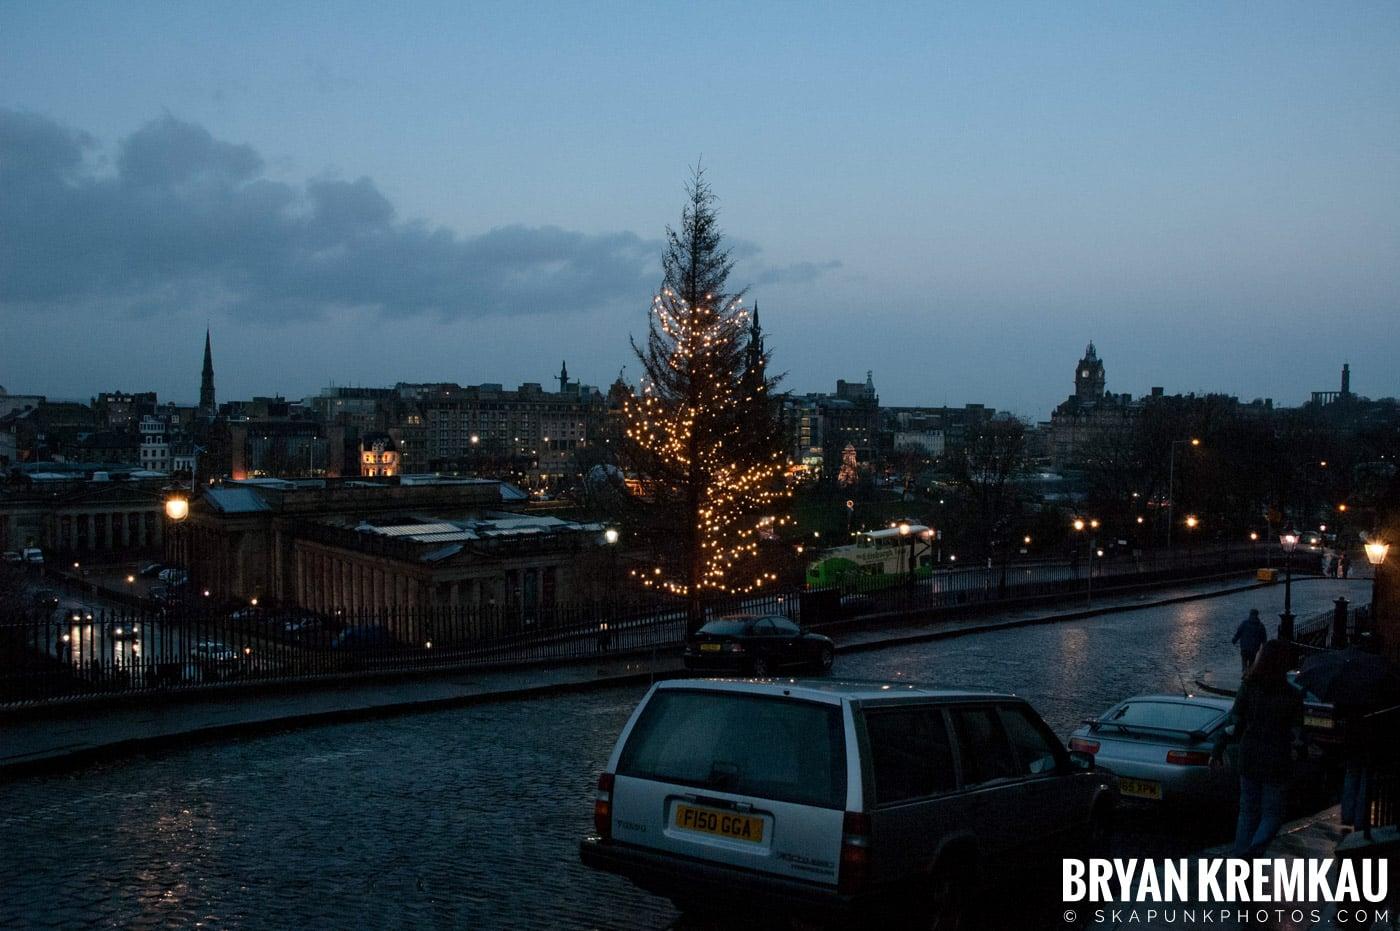 Edinburgh, Scotland - Day 1 - 12.12.06 (18)